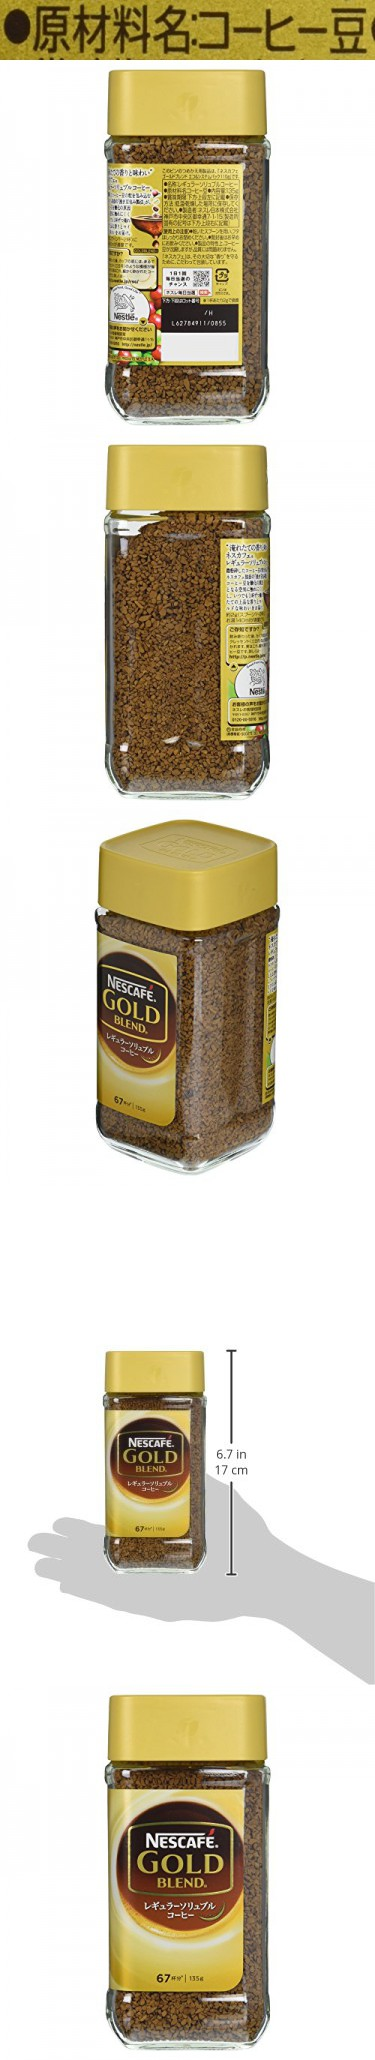 Nescafe Gold Blend 135g Nescafe gold blend, Gold blend